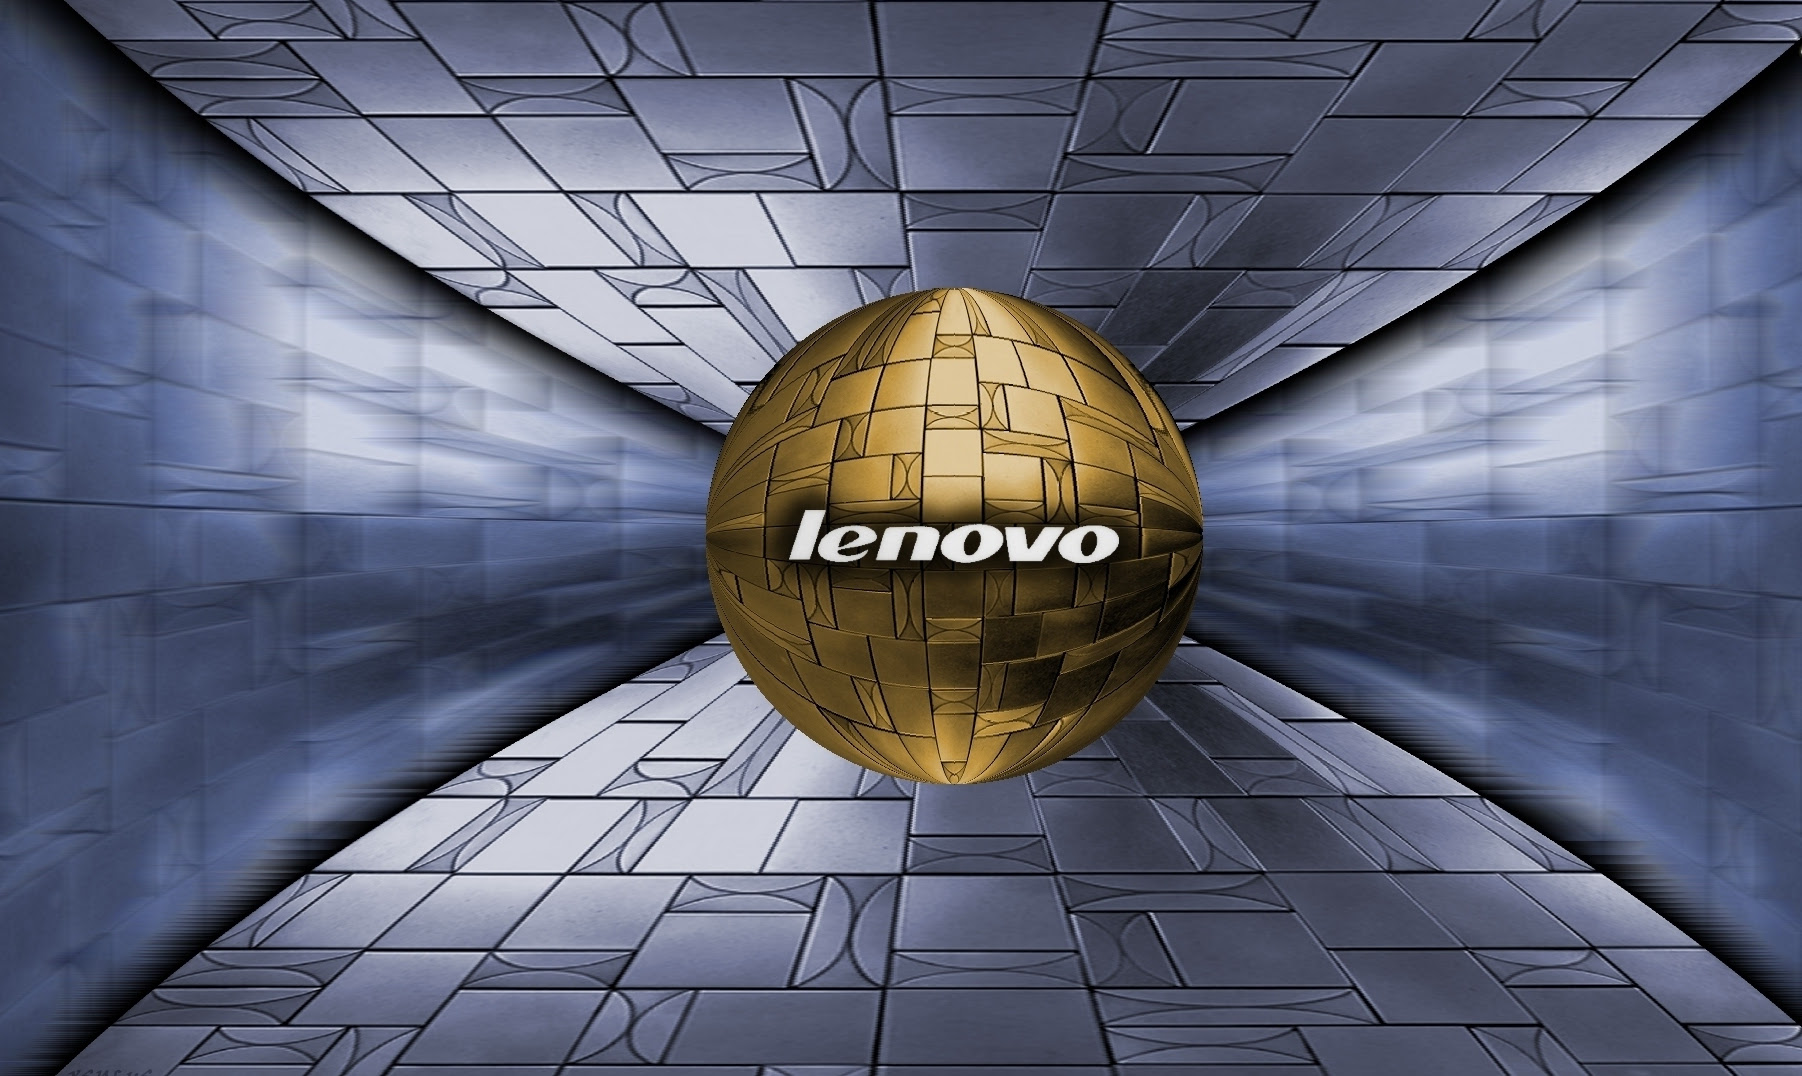 300 Wallpaper For Hp Laptop Hd Quality Free Download  Paling Keren